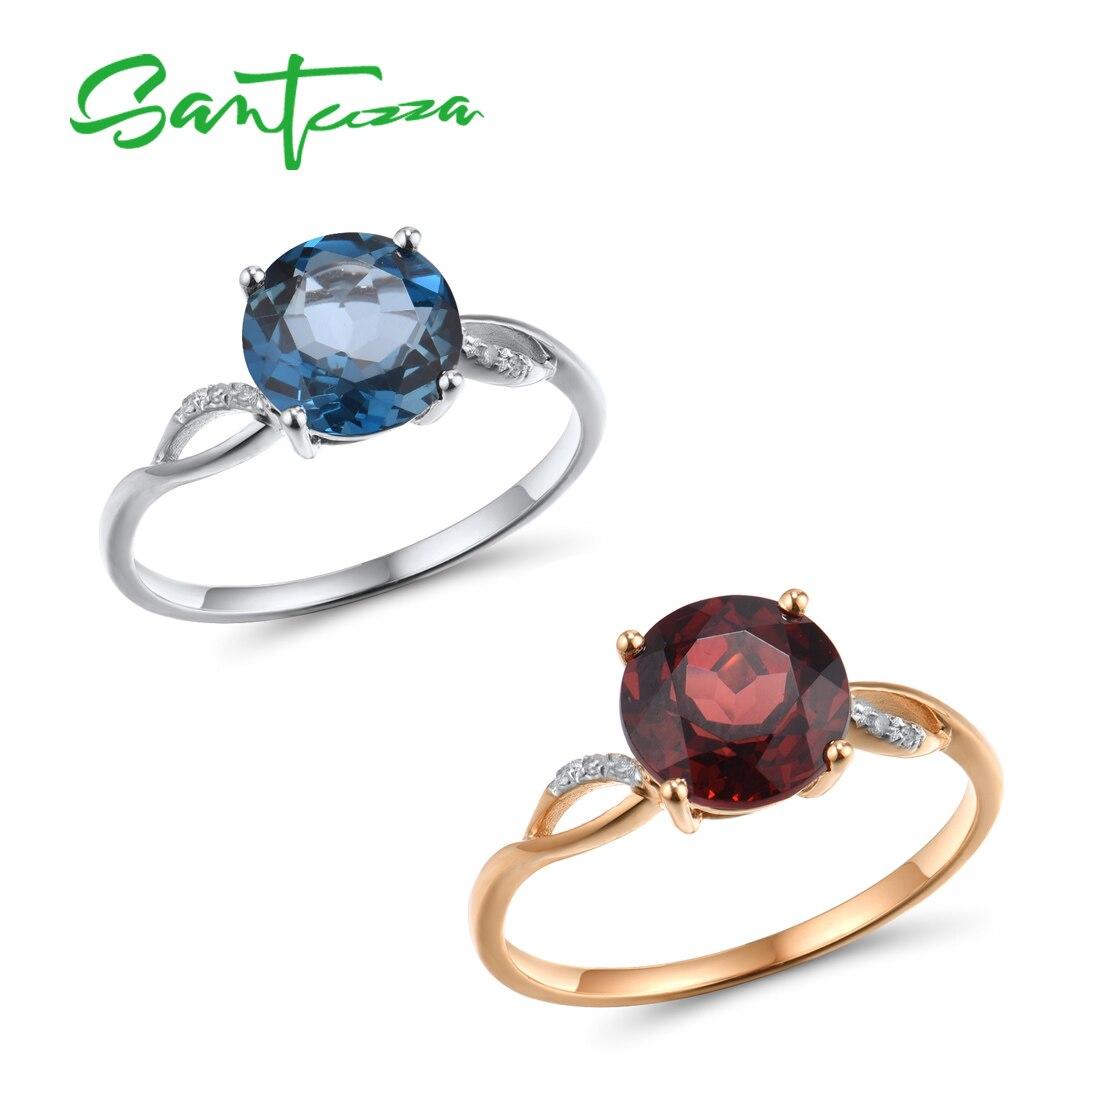 VISTOSO Gold Ring For Women Genuine 14K Gold Ring Sparkling Diamond London Blue Topaz Garnet Wedding Anniversary Fine Jewelry